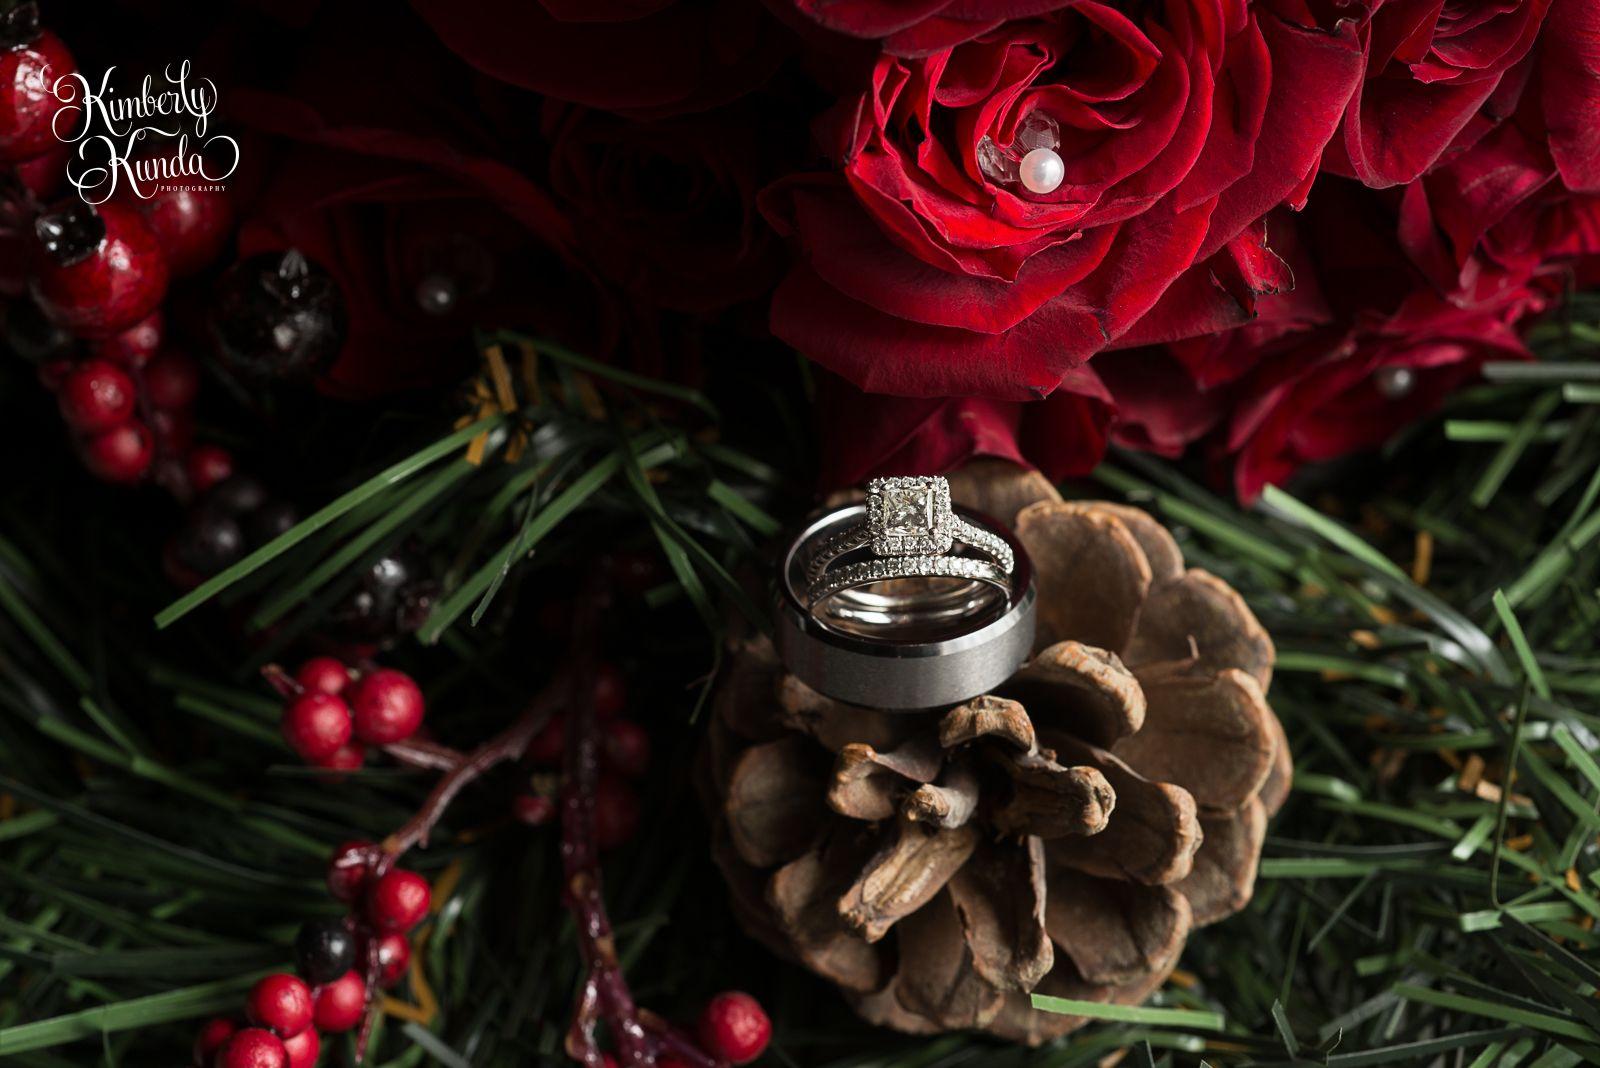 I love the jewelry we choose to share with our loves forever... #kimberlykunda #kimberlykundaphotography #kkp #kkpweddings #winterwedding #decemberwedding #engagementring #weddingring #christmaswedding